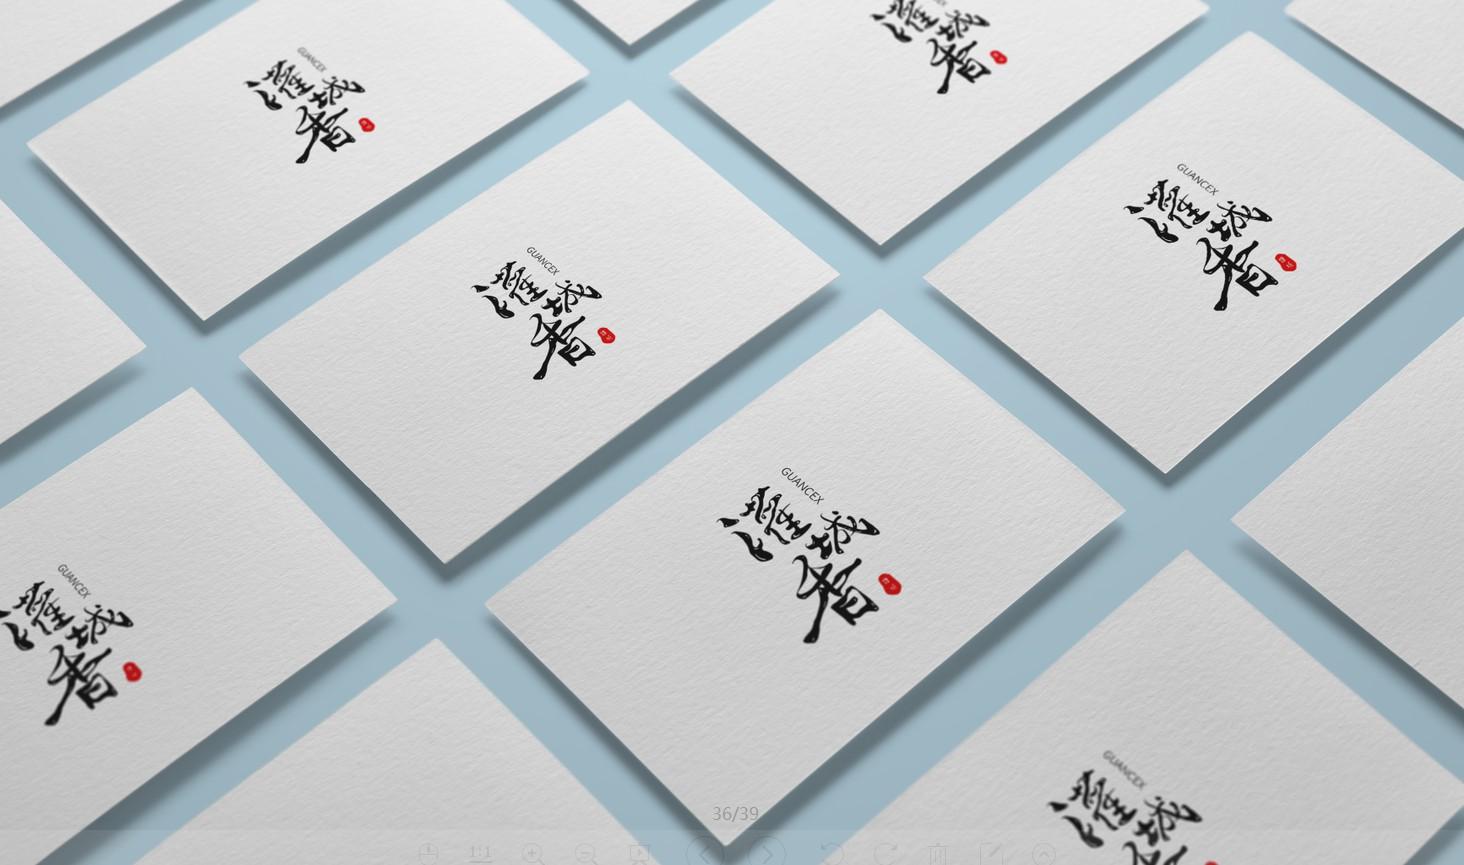 LOGO创意设计,品牌:灌城香(6.11附件有更新)_3033521_k68威客网